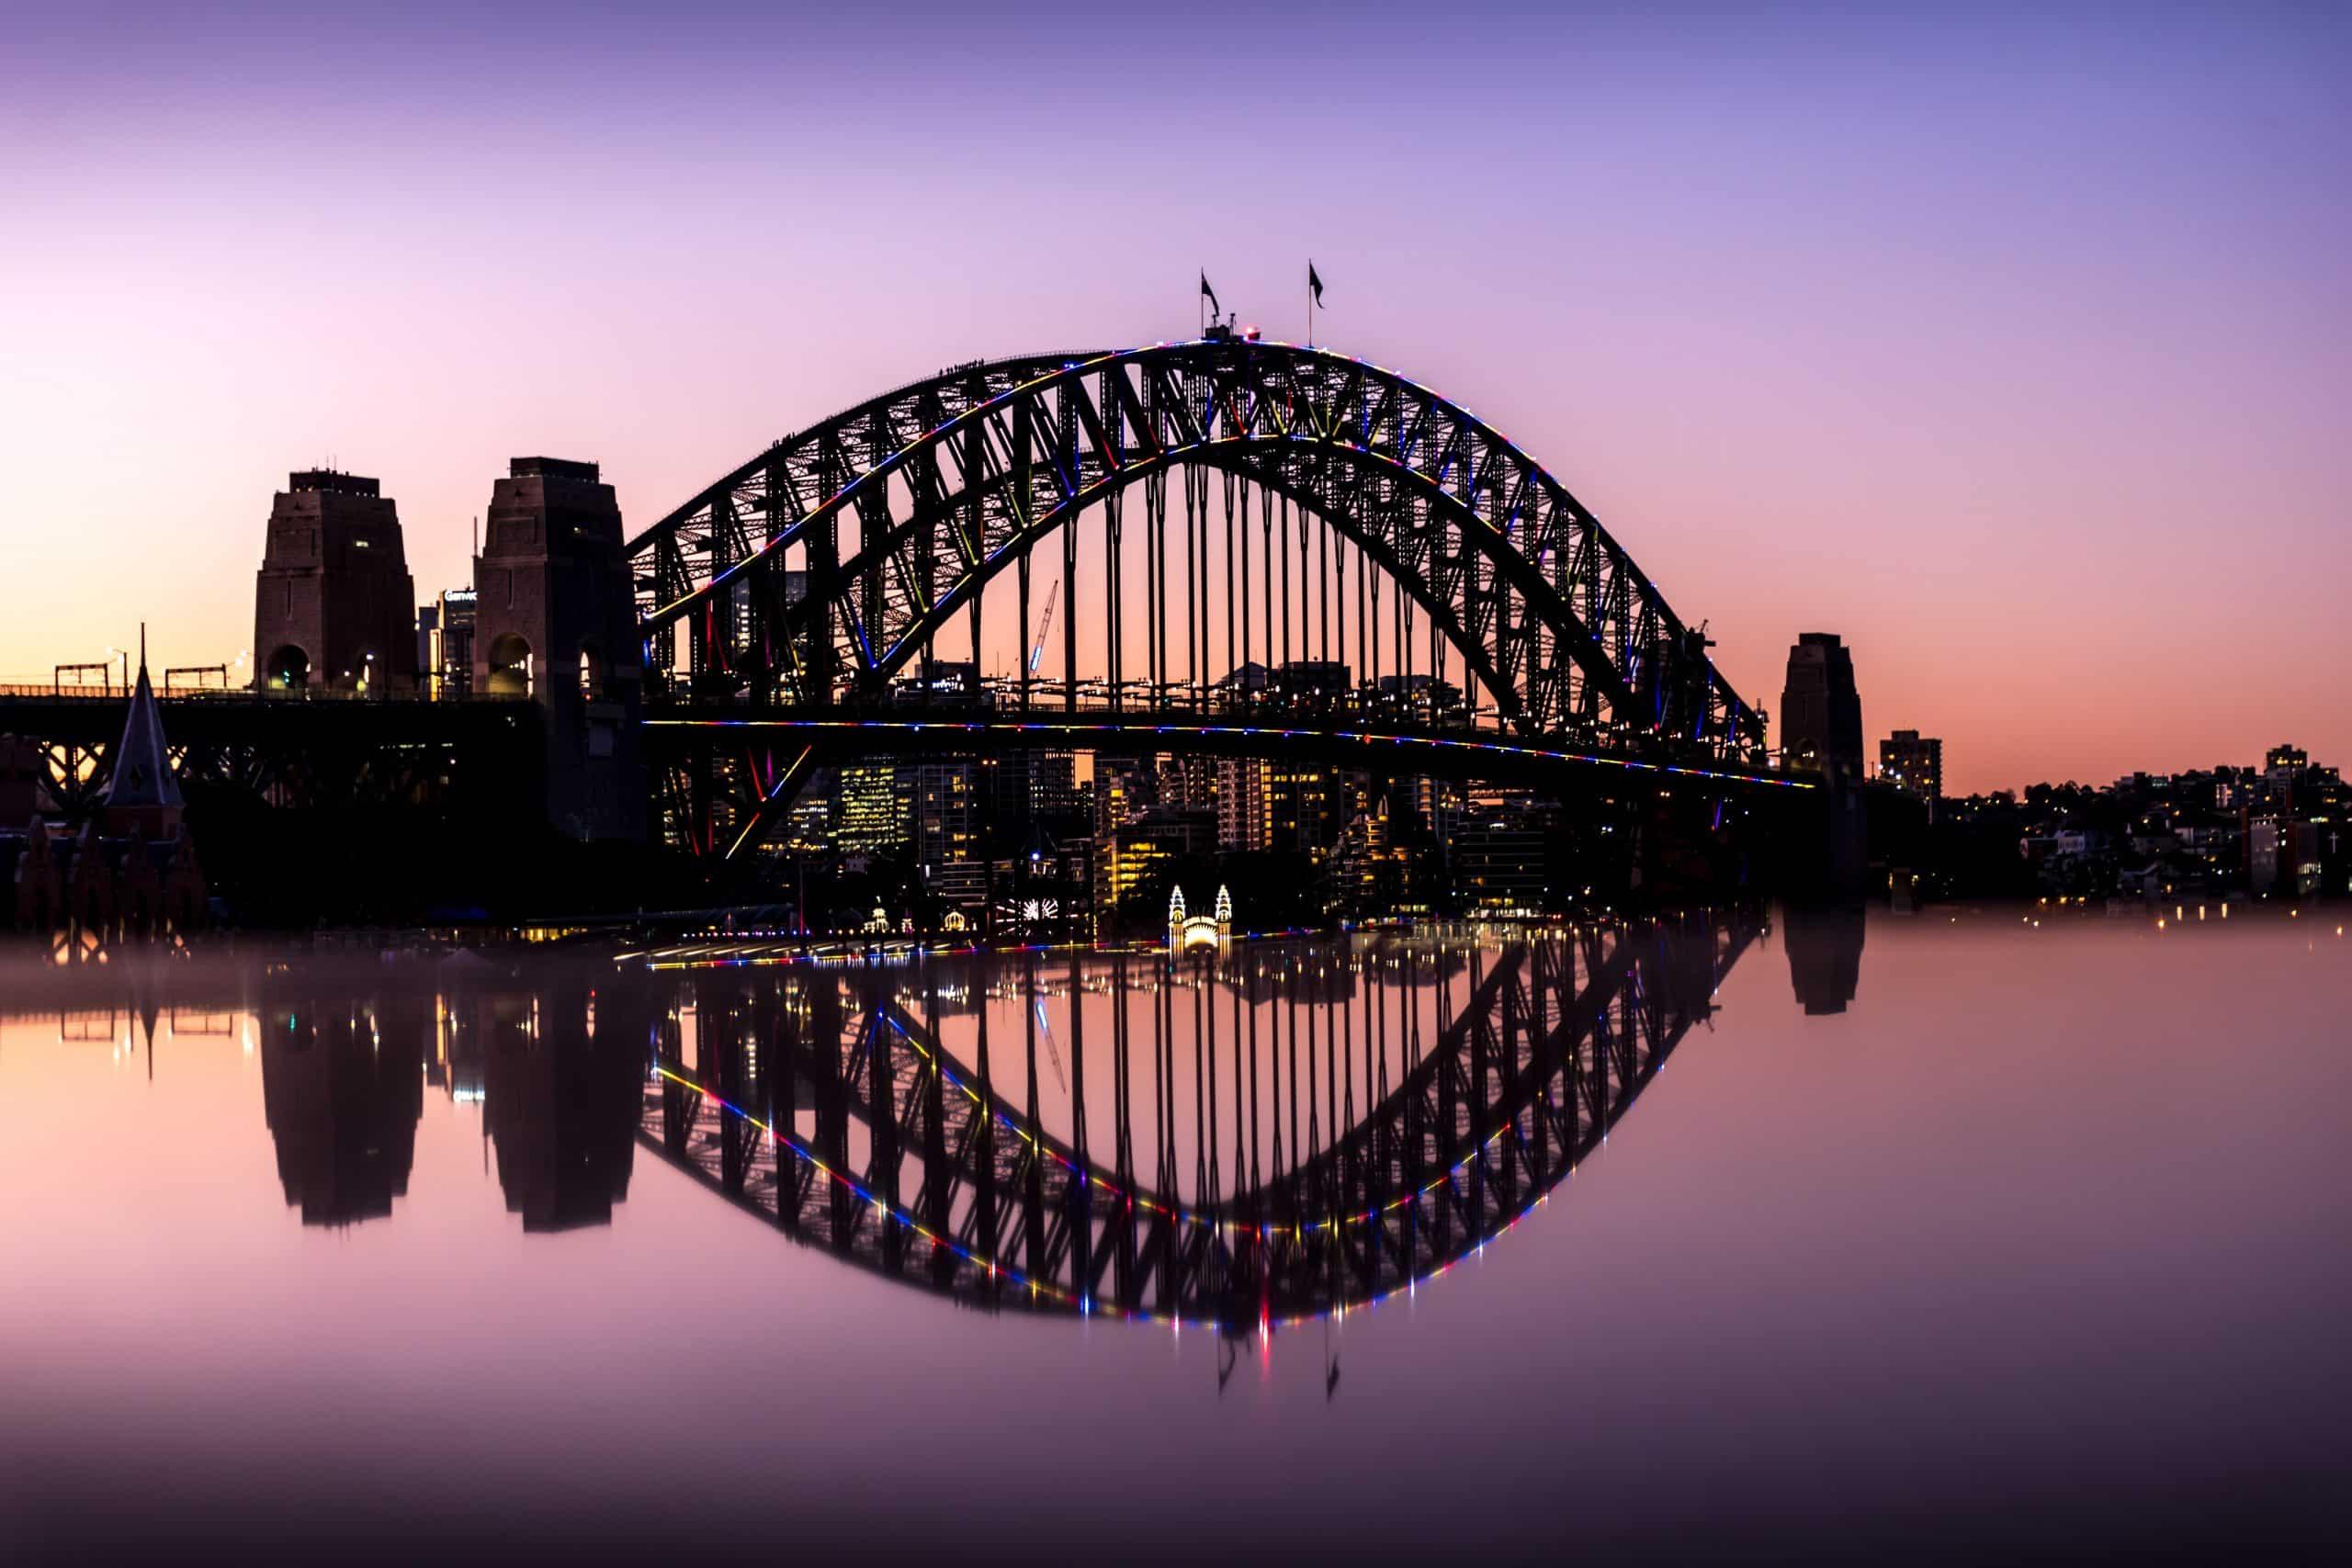 Competition starts to design new bike ramp for Sydney Harbour Bridge